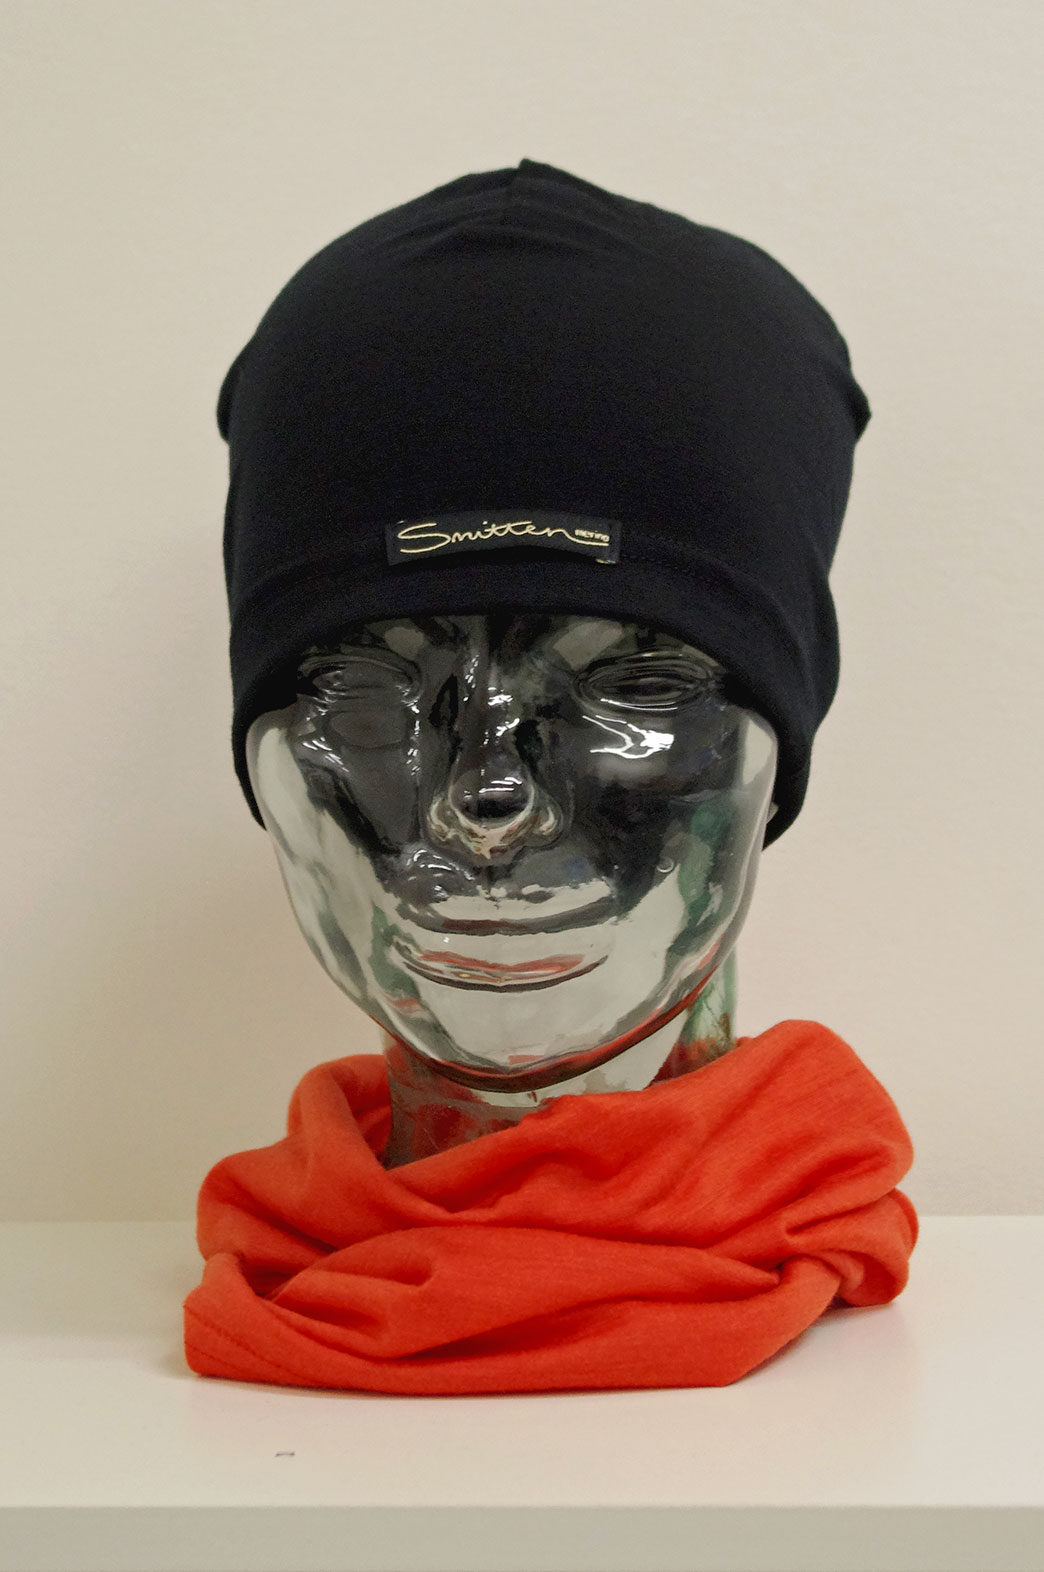 Beanie - Lightweight Skull Cap - Unisex Black Lightweight Merino Wool Skull Cap Beanie - Smitten Merino Tasmania Australia